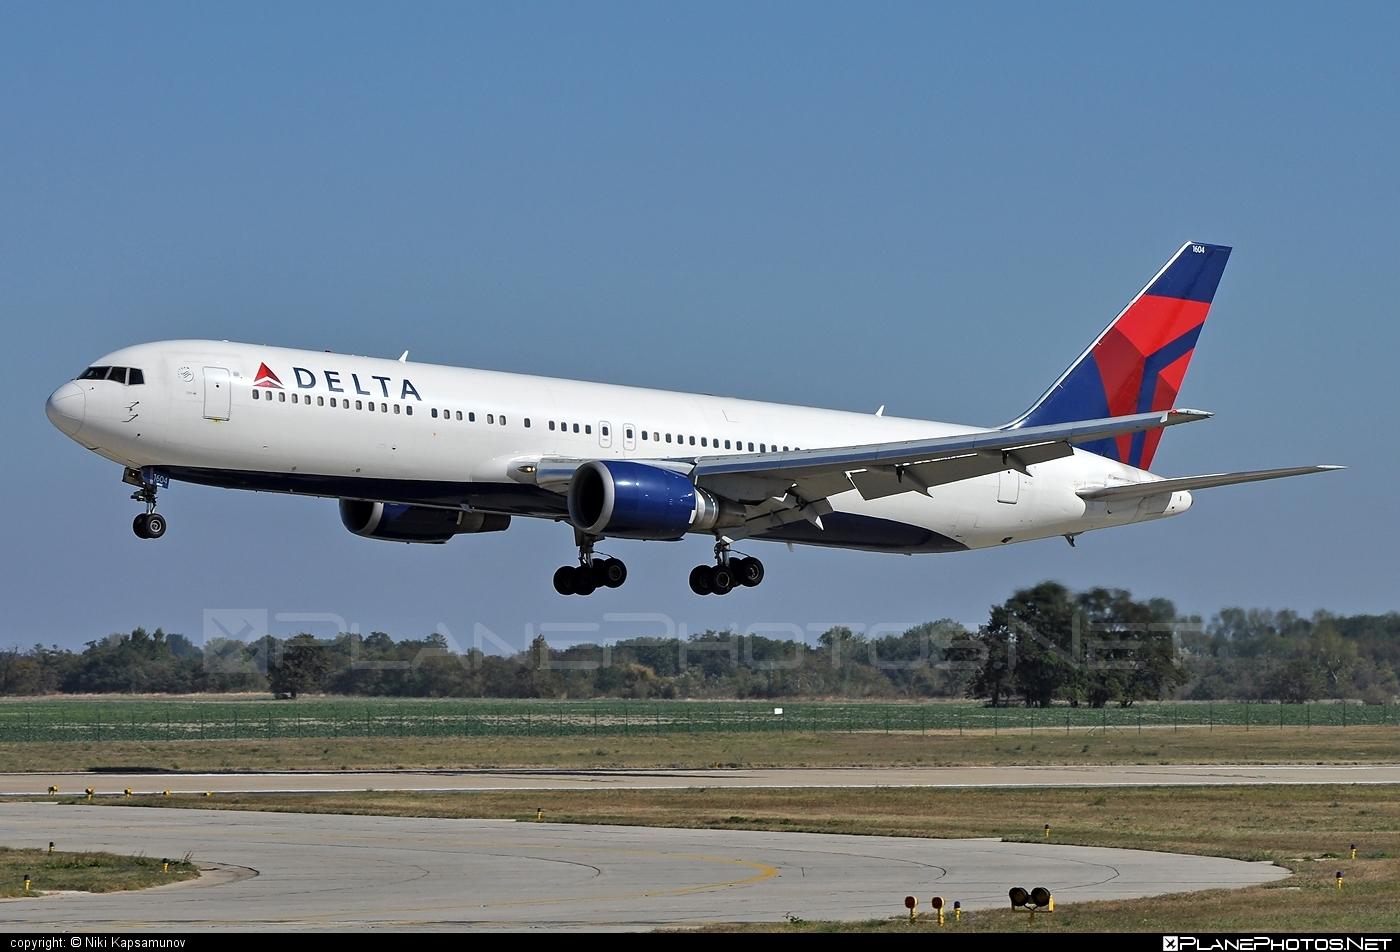 Boeing 767-300ER - N1604R operated by Delta Air Lines #b767 #b767er #boeing #boeing767 #deltaairlines